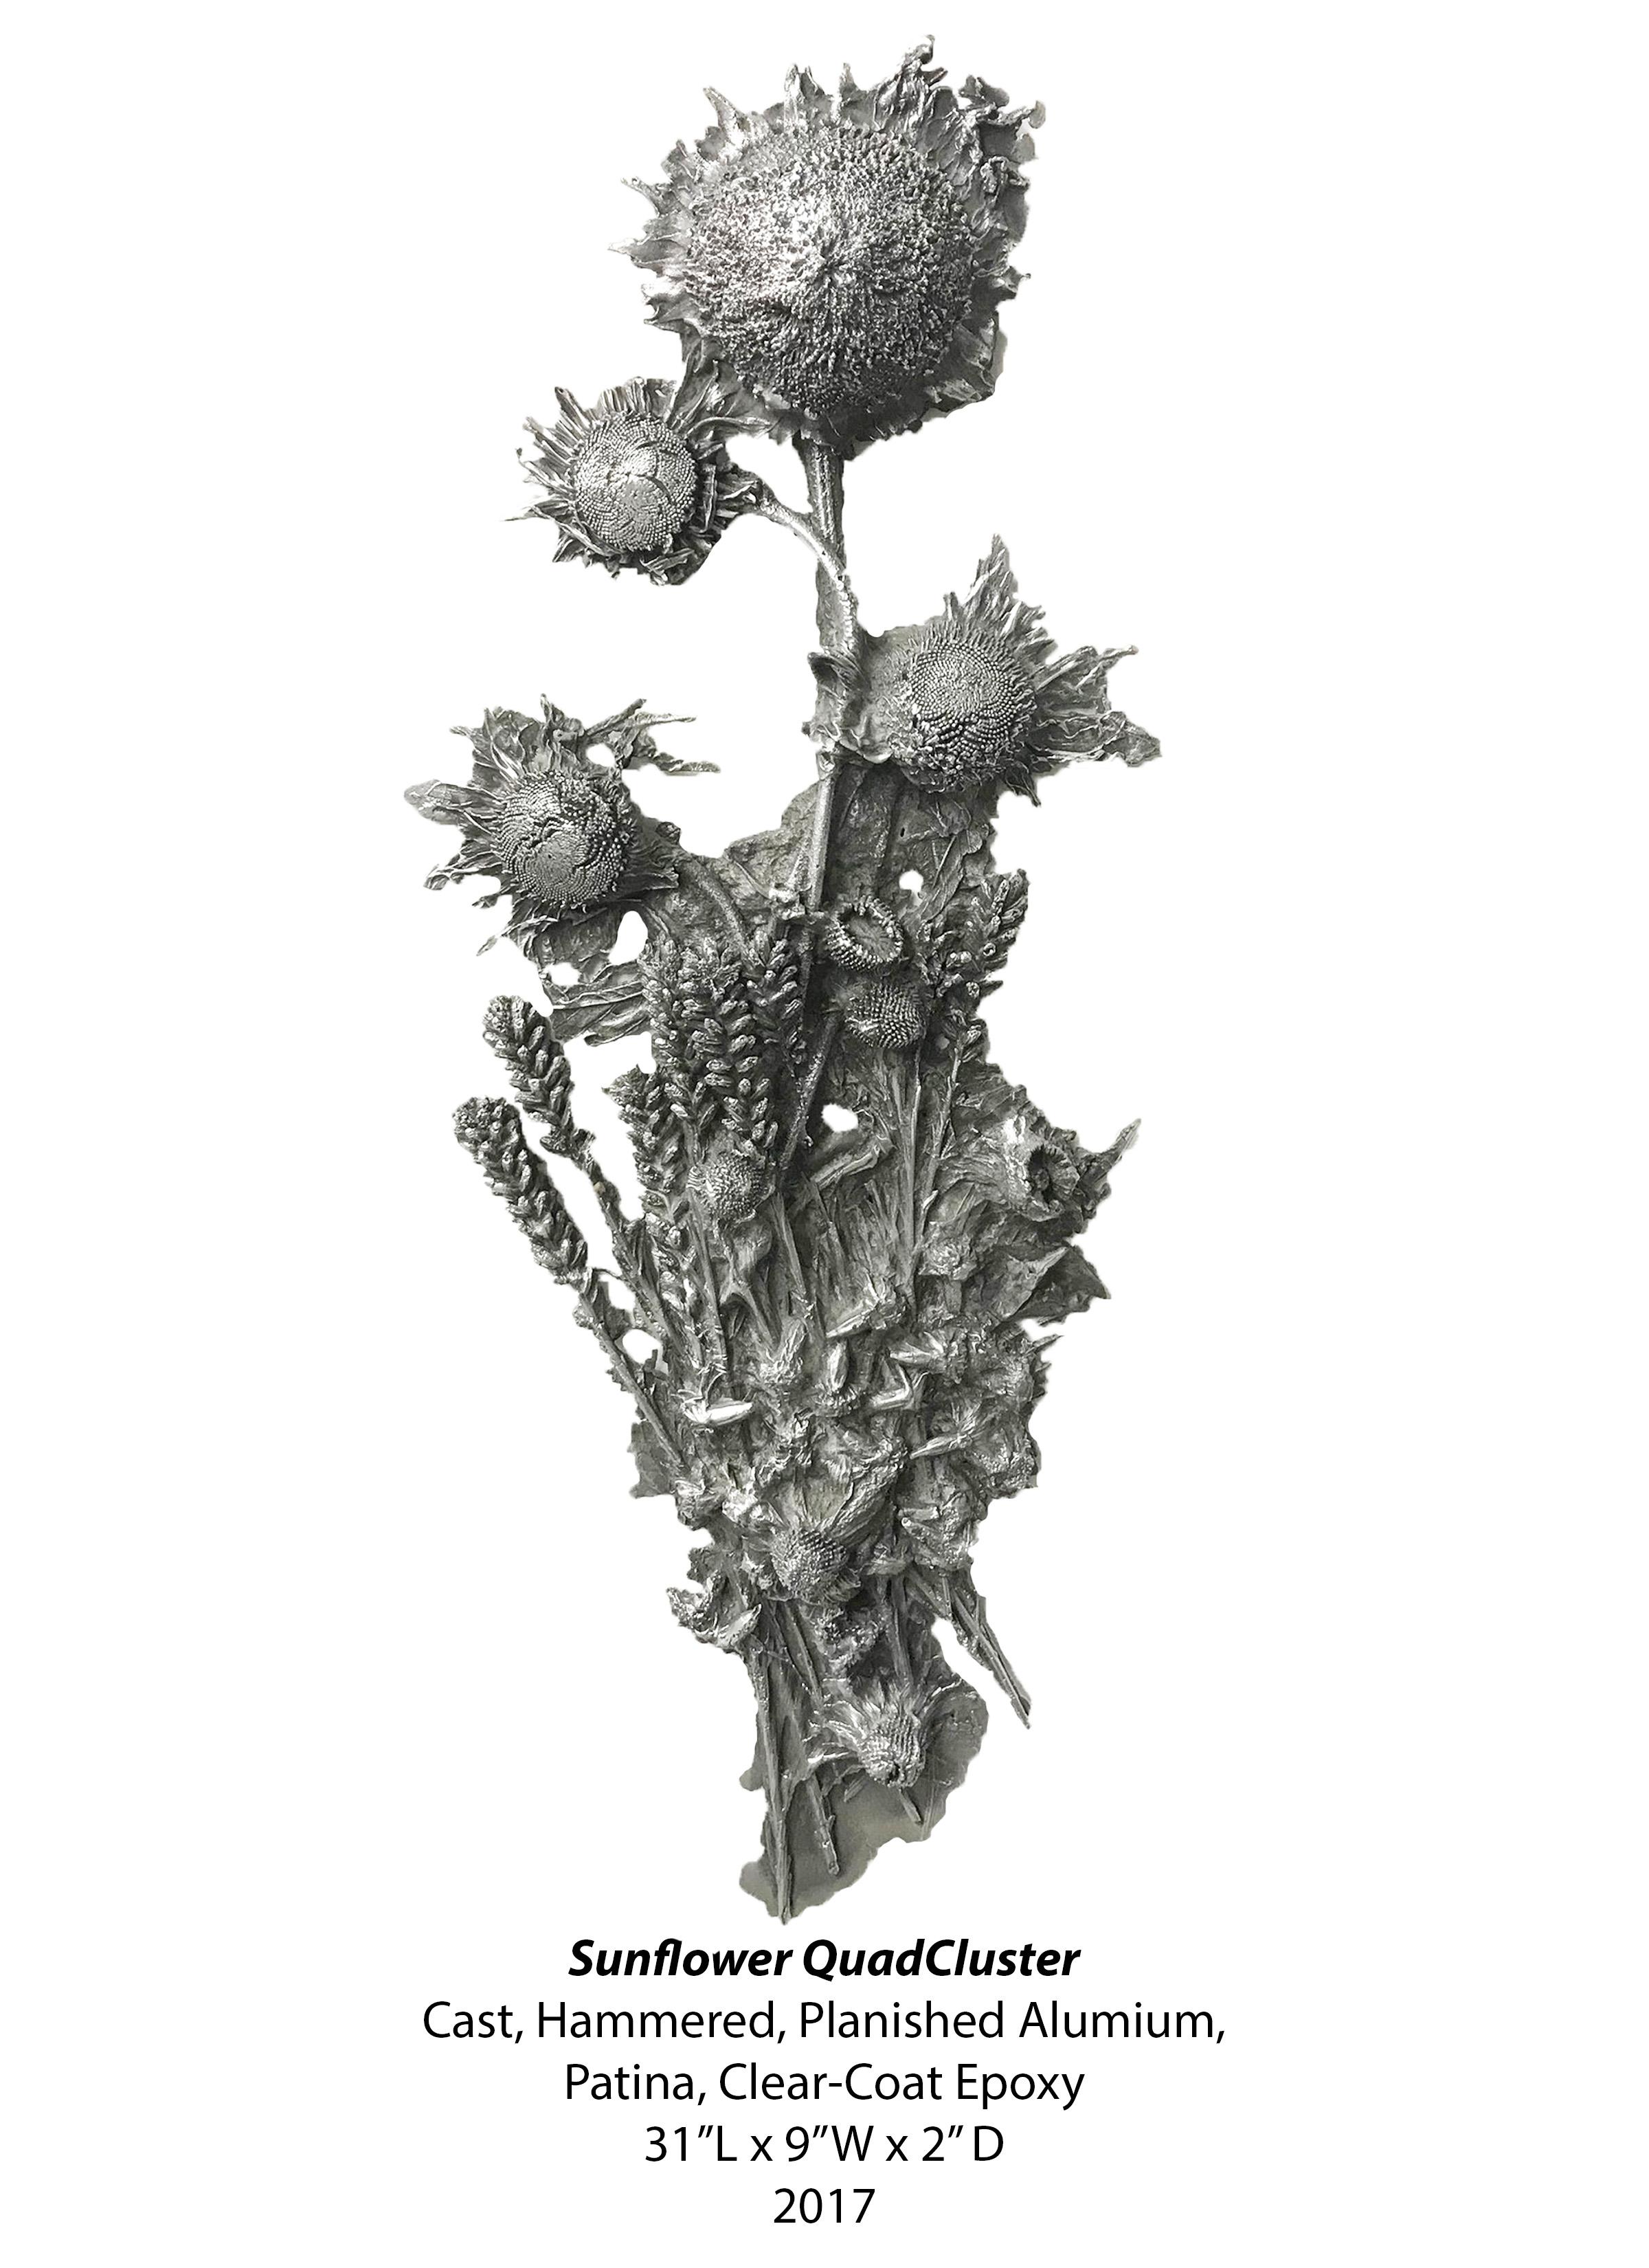 SunflowerQuadCluster.jpg